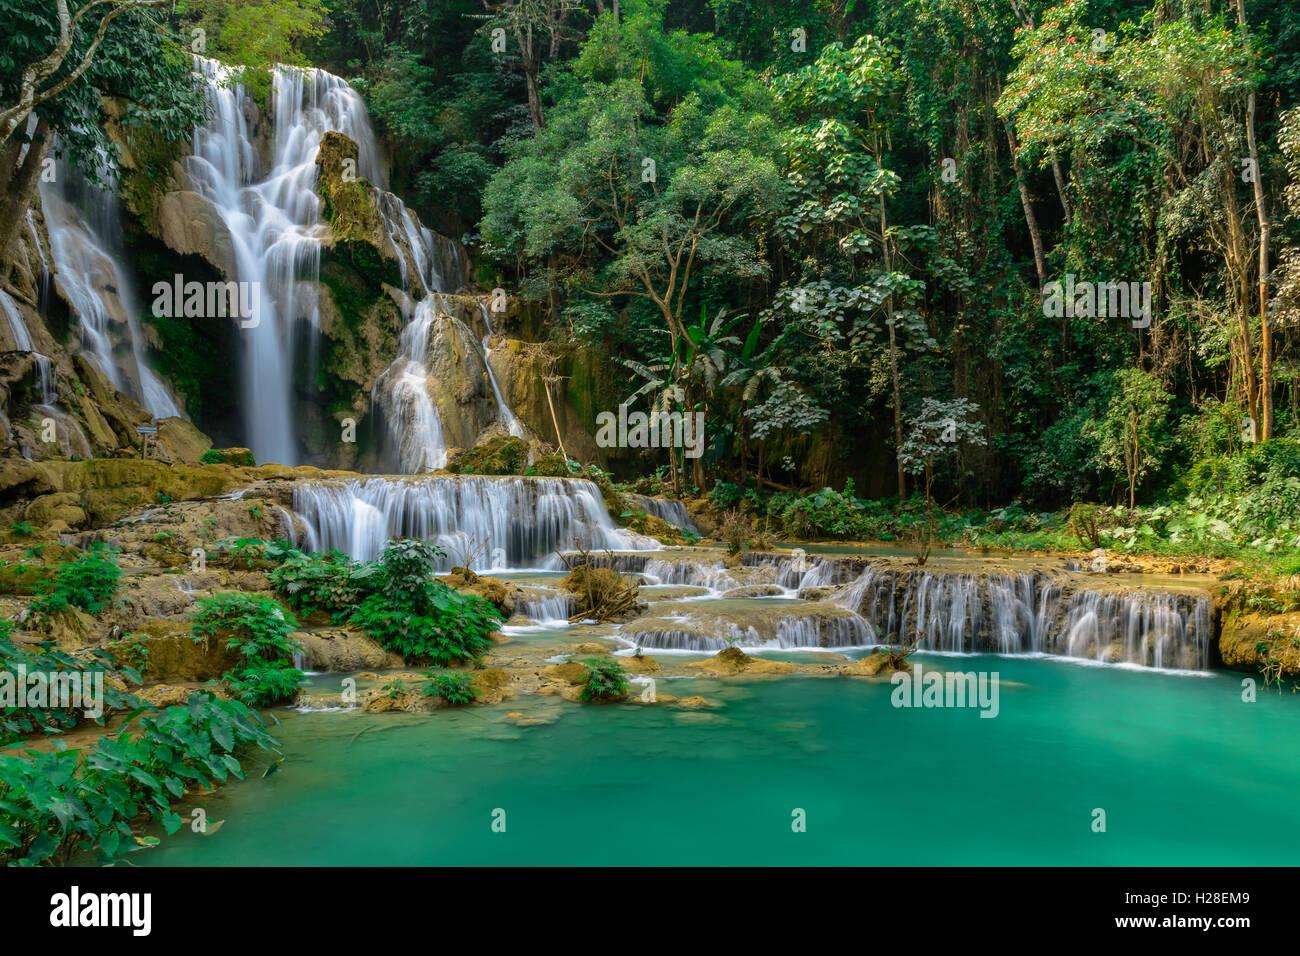 Kuang si water fall in Luang prabang,Laos. Stock Photo